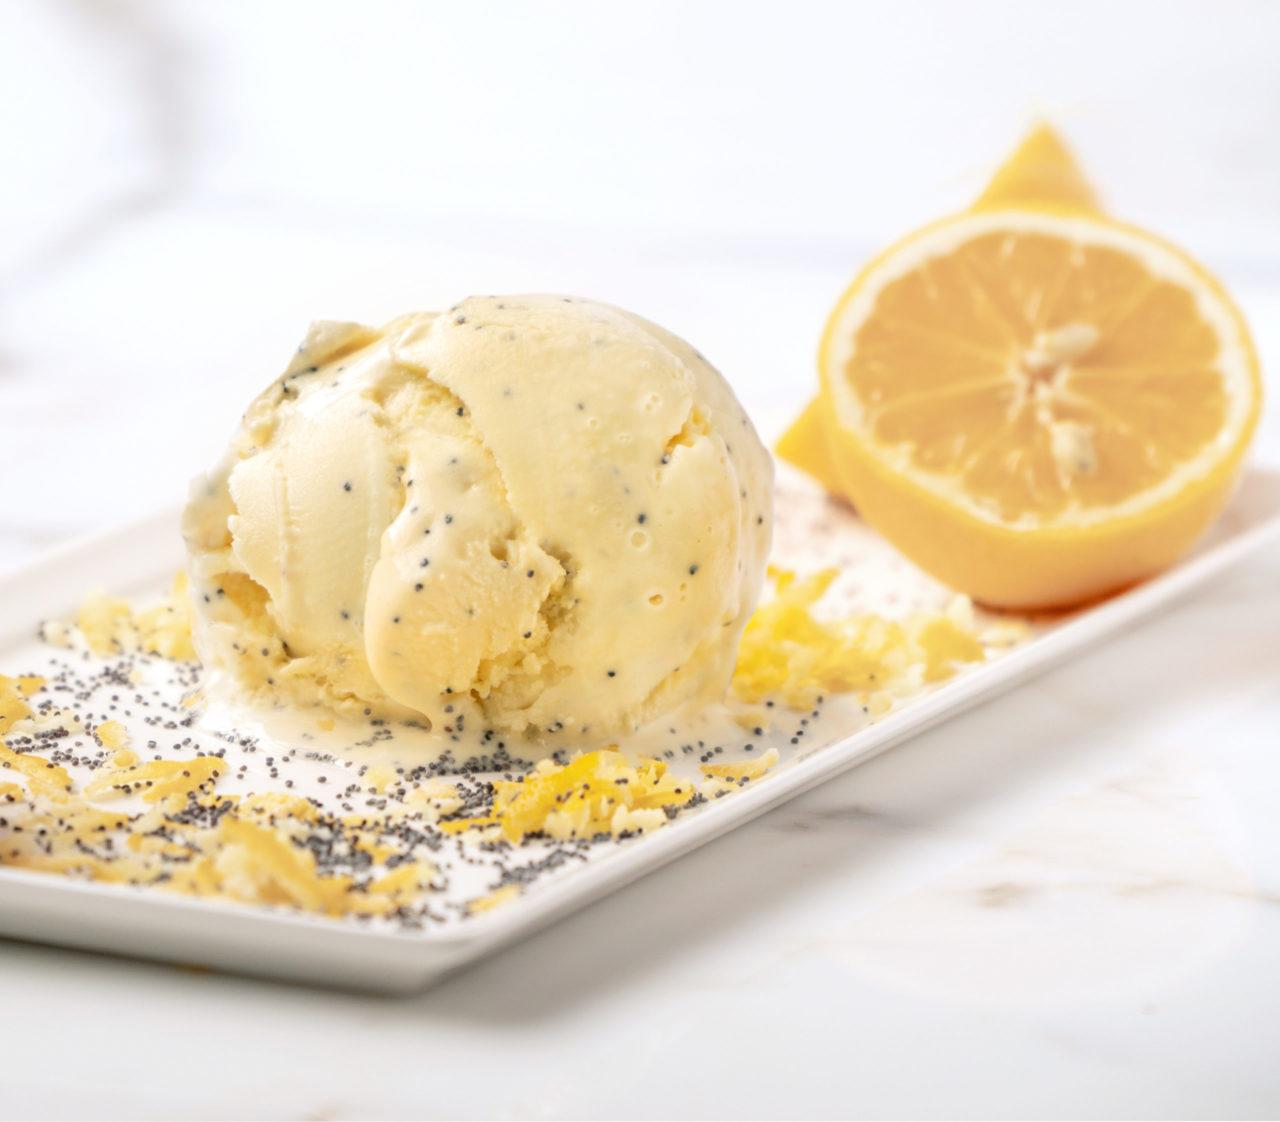 Meet a Maker: George Haymaker III of Re:THINK Ice Cream